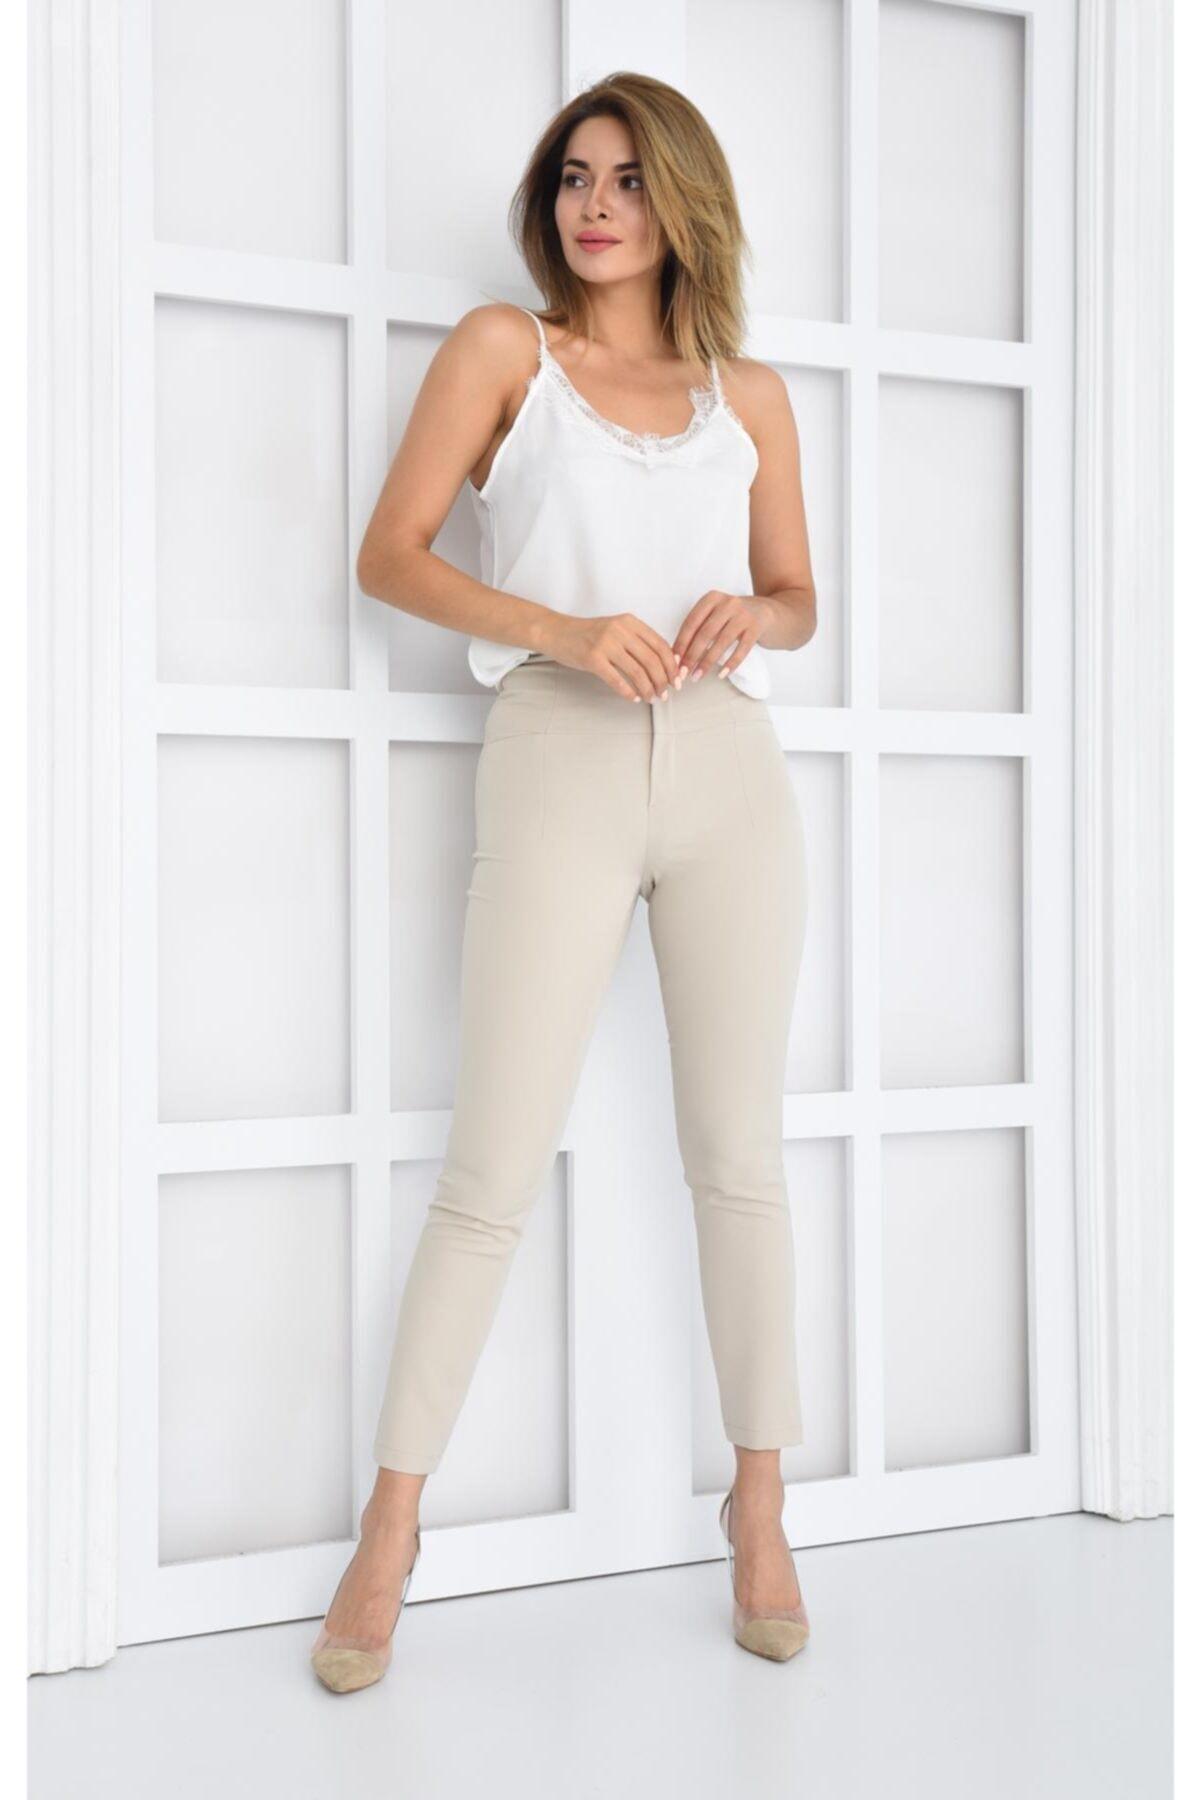 İroni Yüksek Bel Korsajlı Pantolon 1